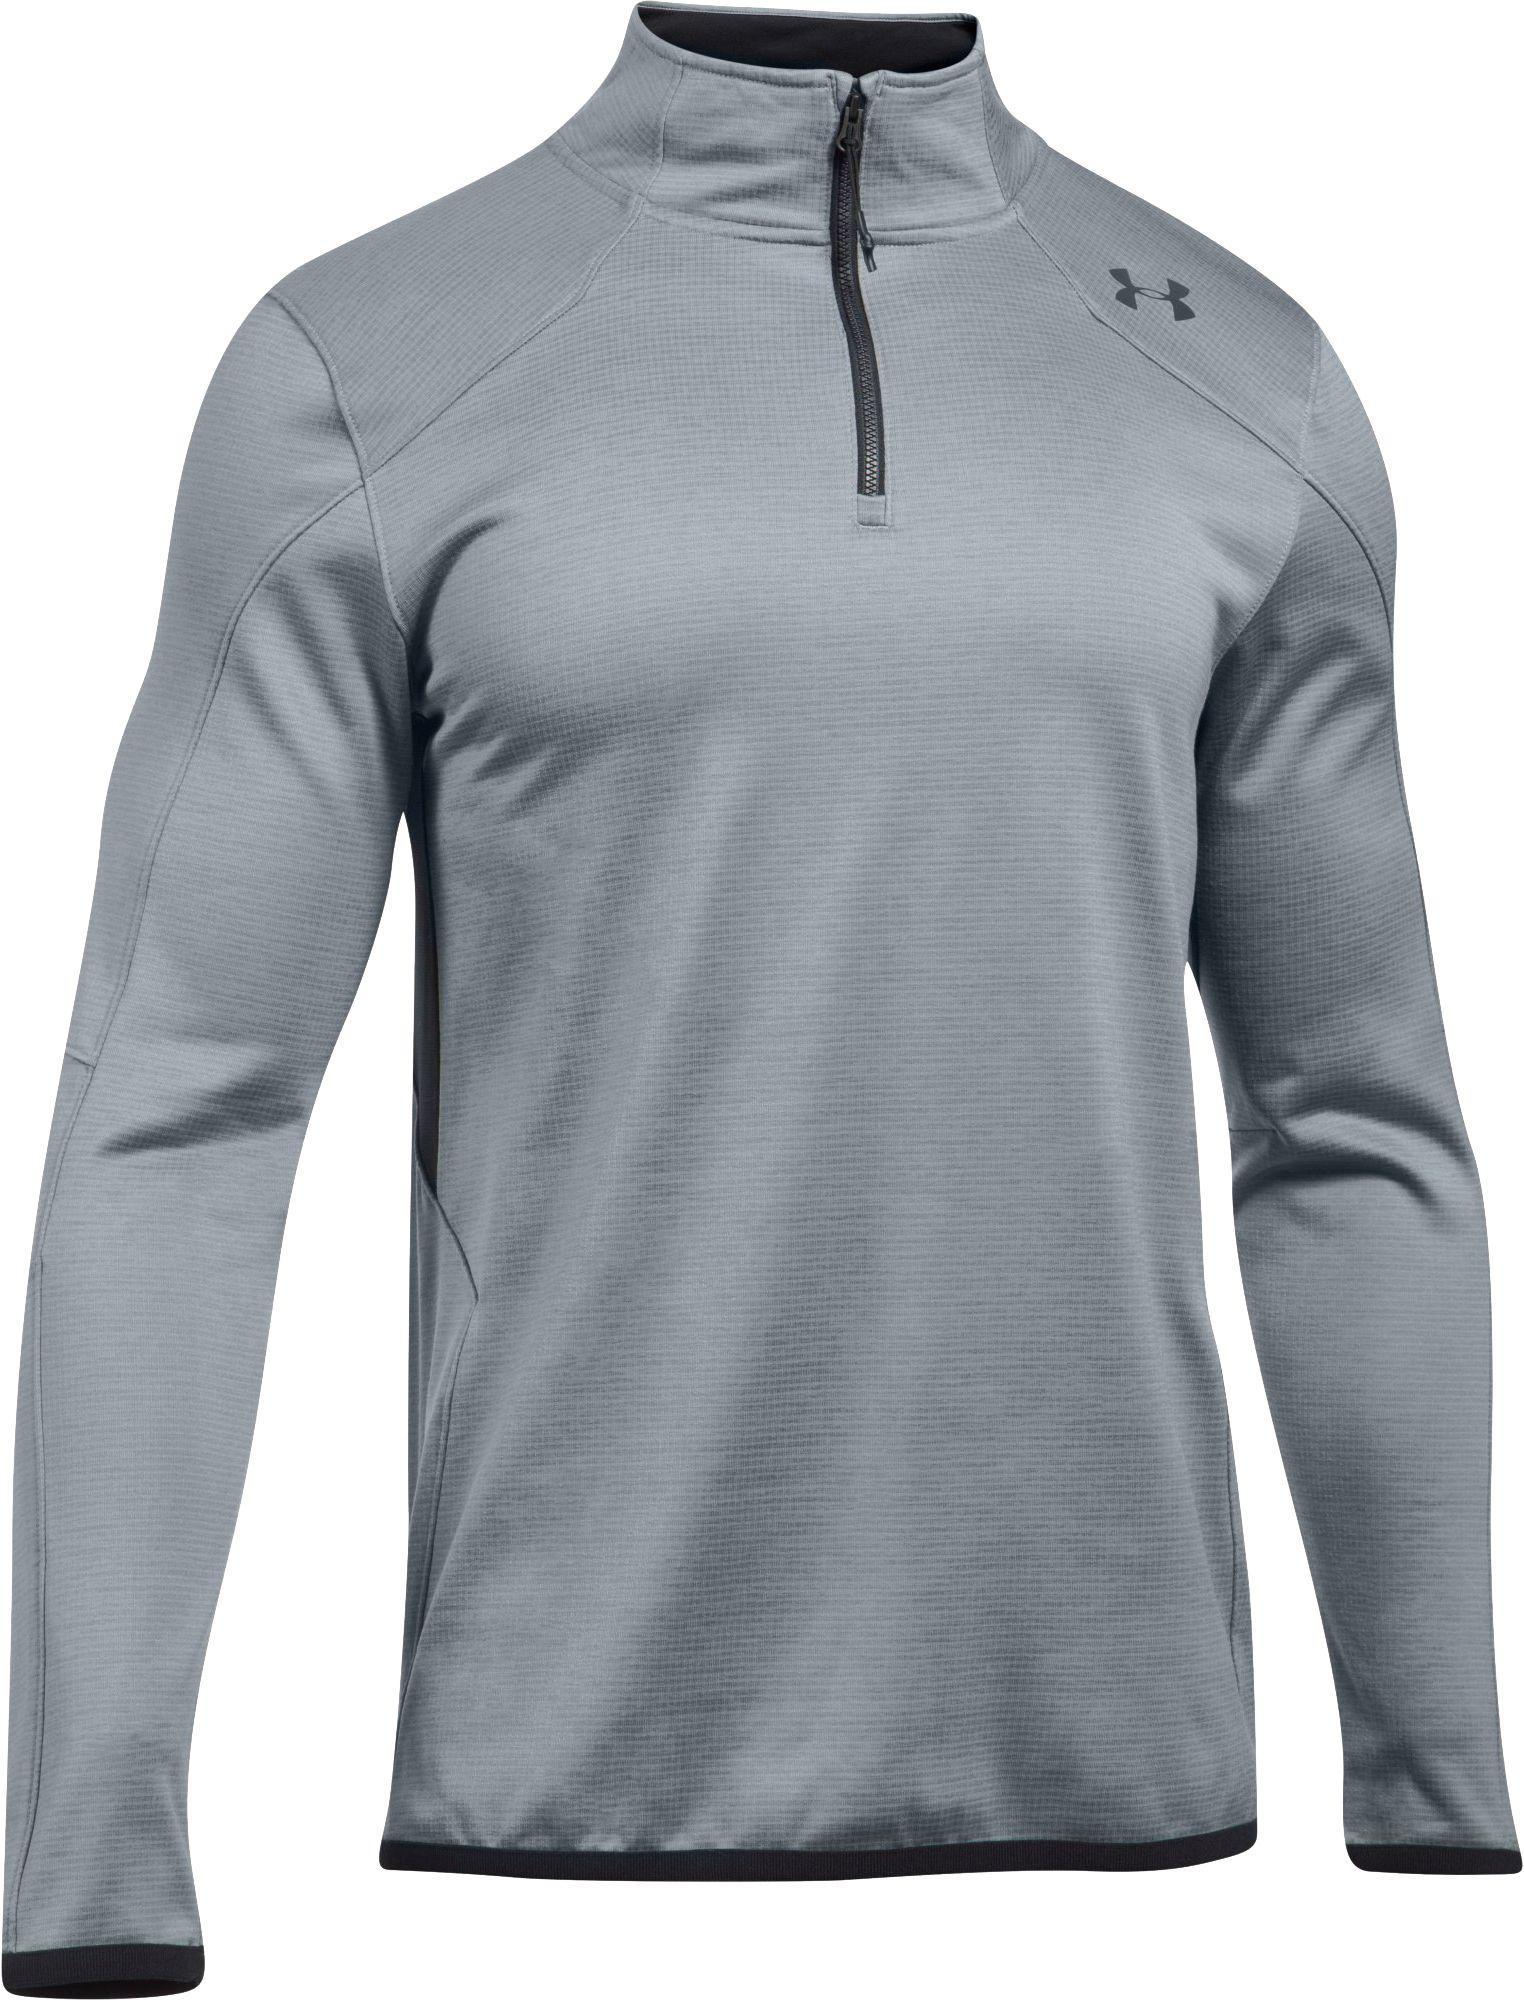 a693f644c6c Lyst - Under Armour Coldgear Reactor 1 4 Zip Long Sleeve T-shirt in ...